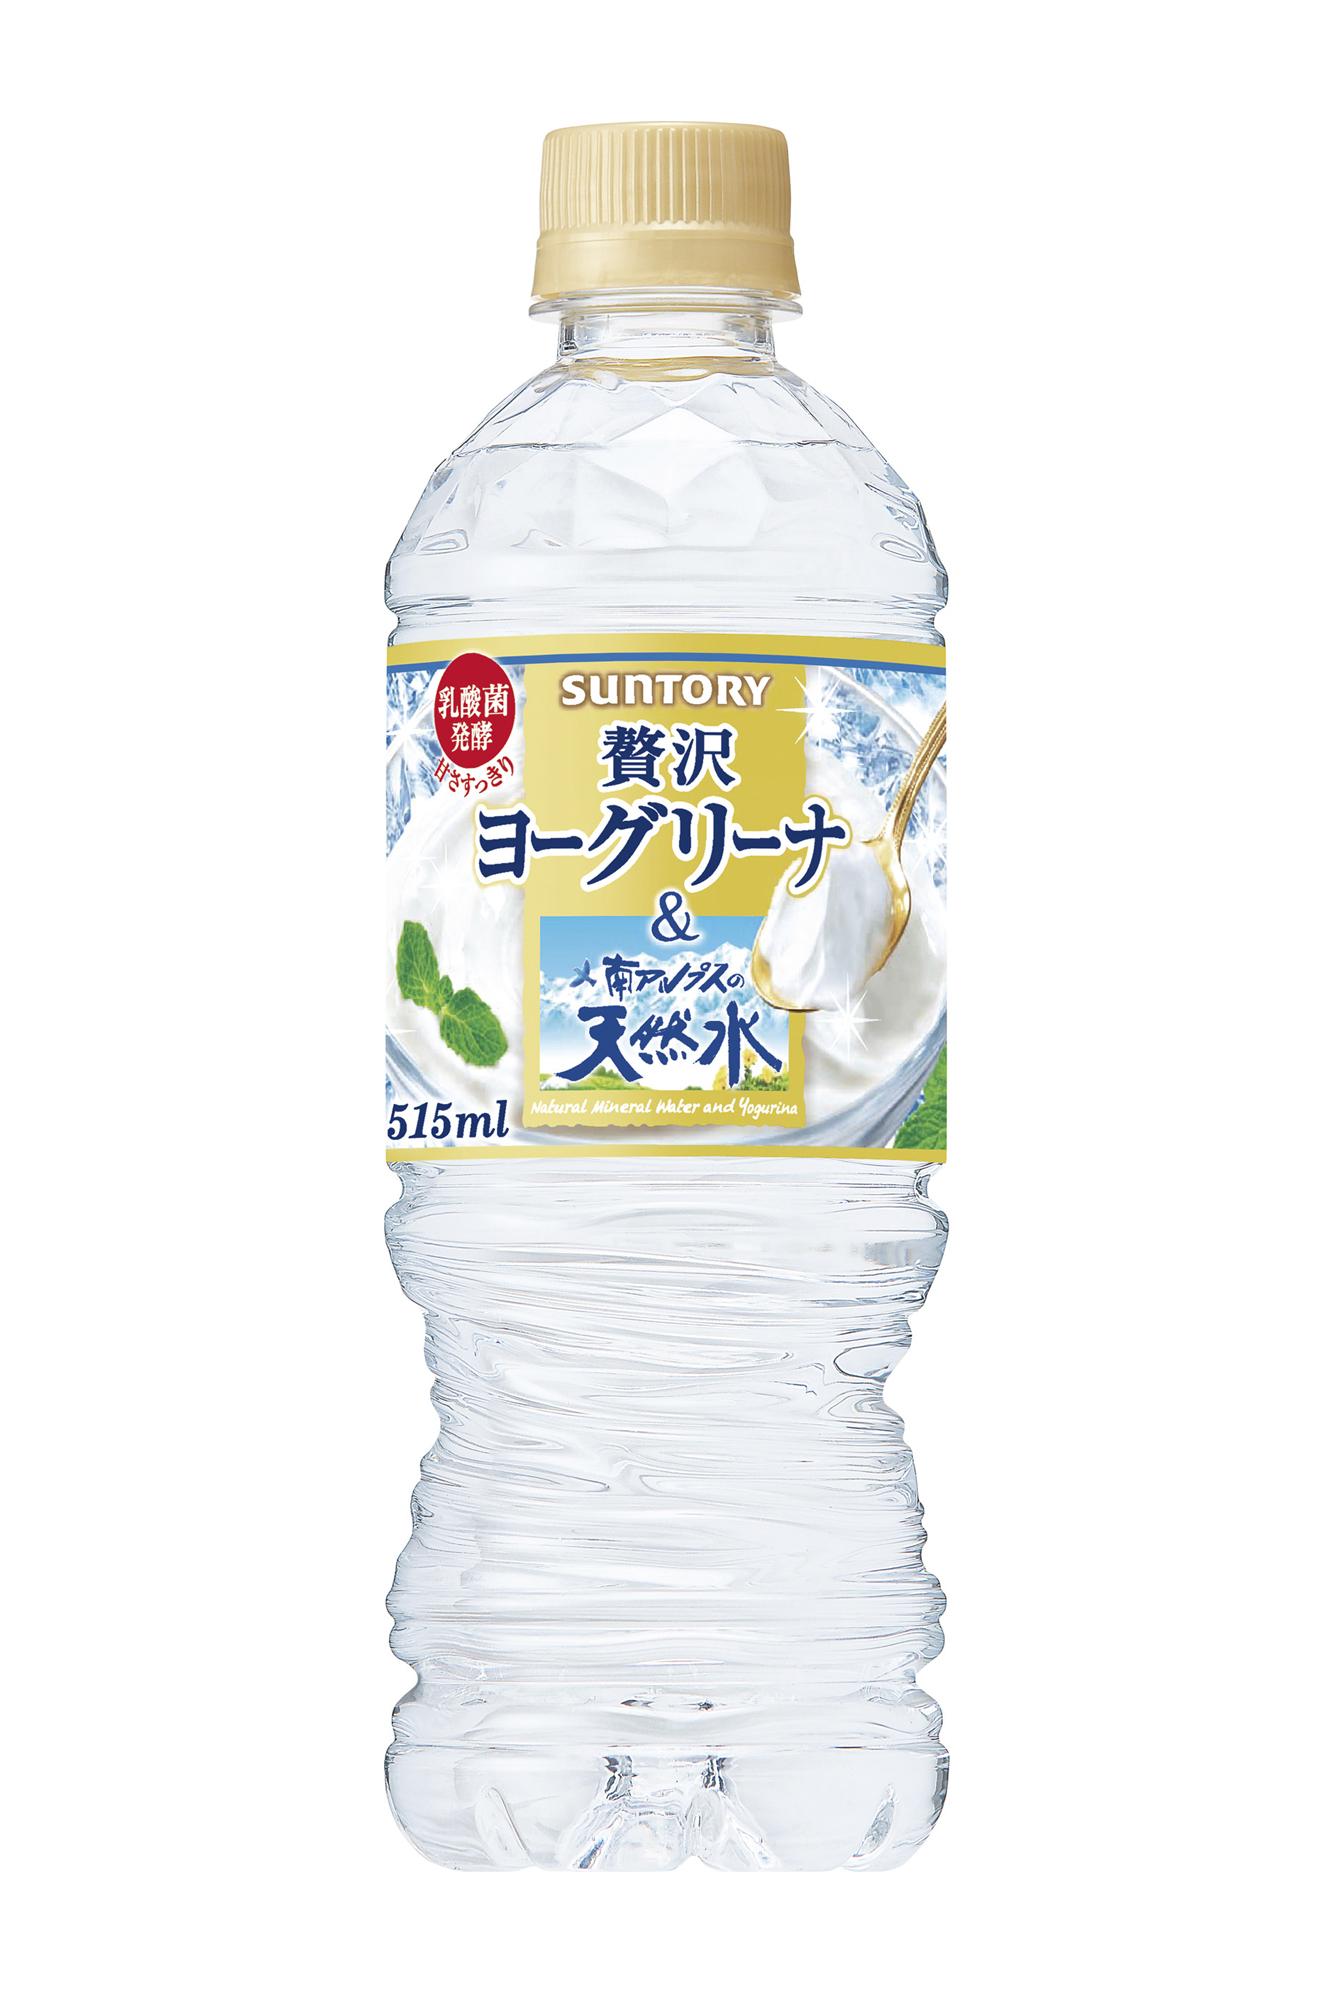 http://www.suntory.co.jp/softdrink/news/l_img/l_sbf0246-1.jpg